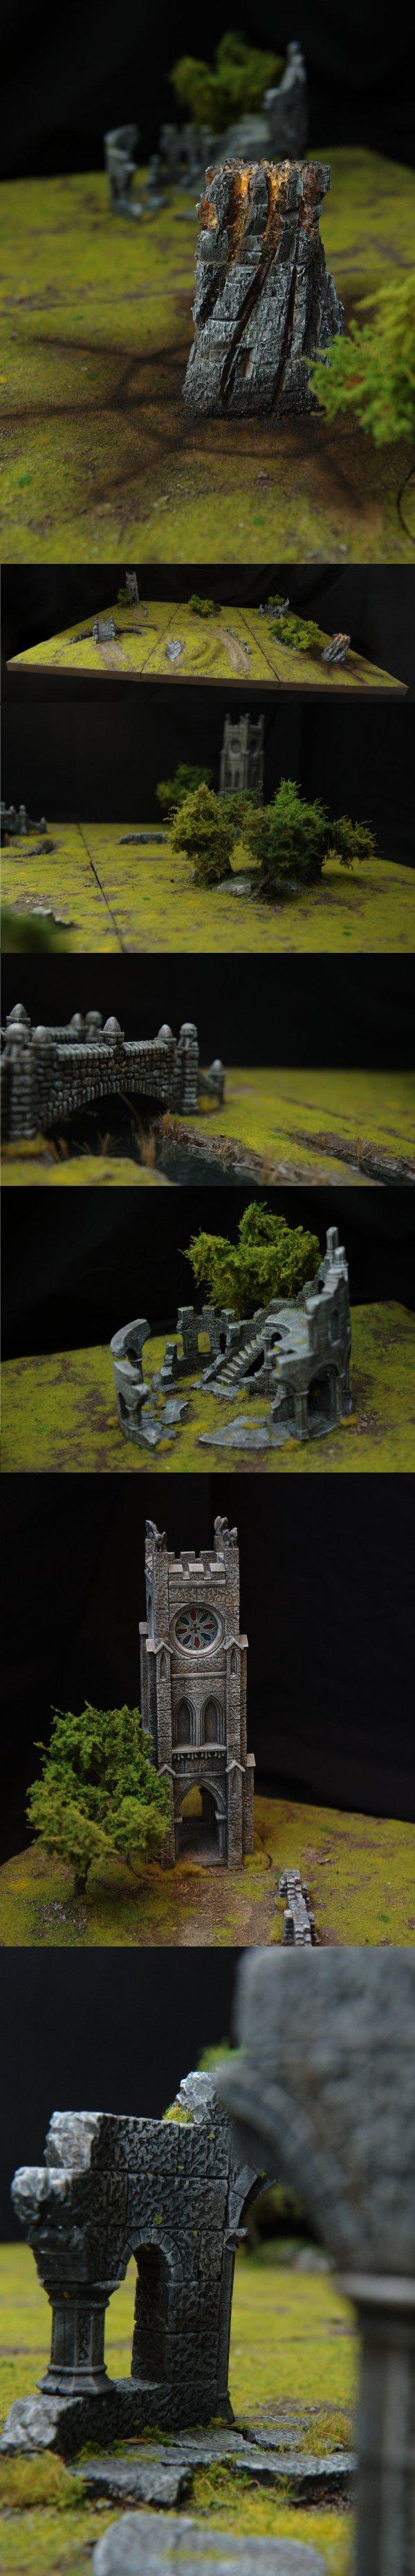 Warhammer Fantasy Modular Gaming Board